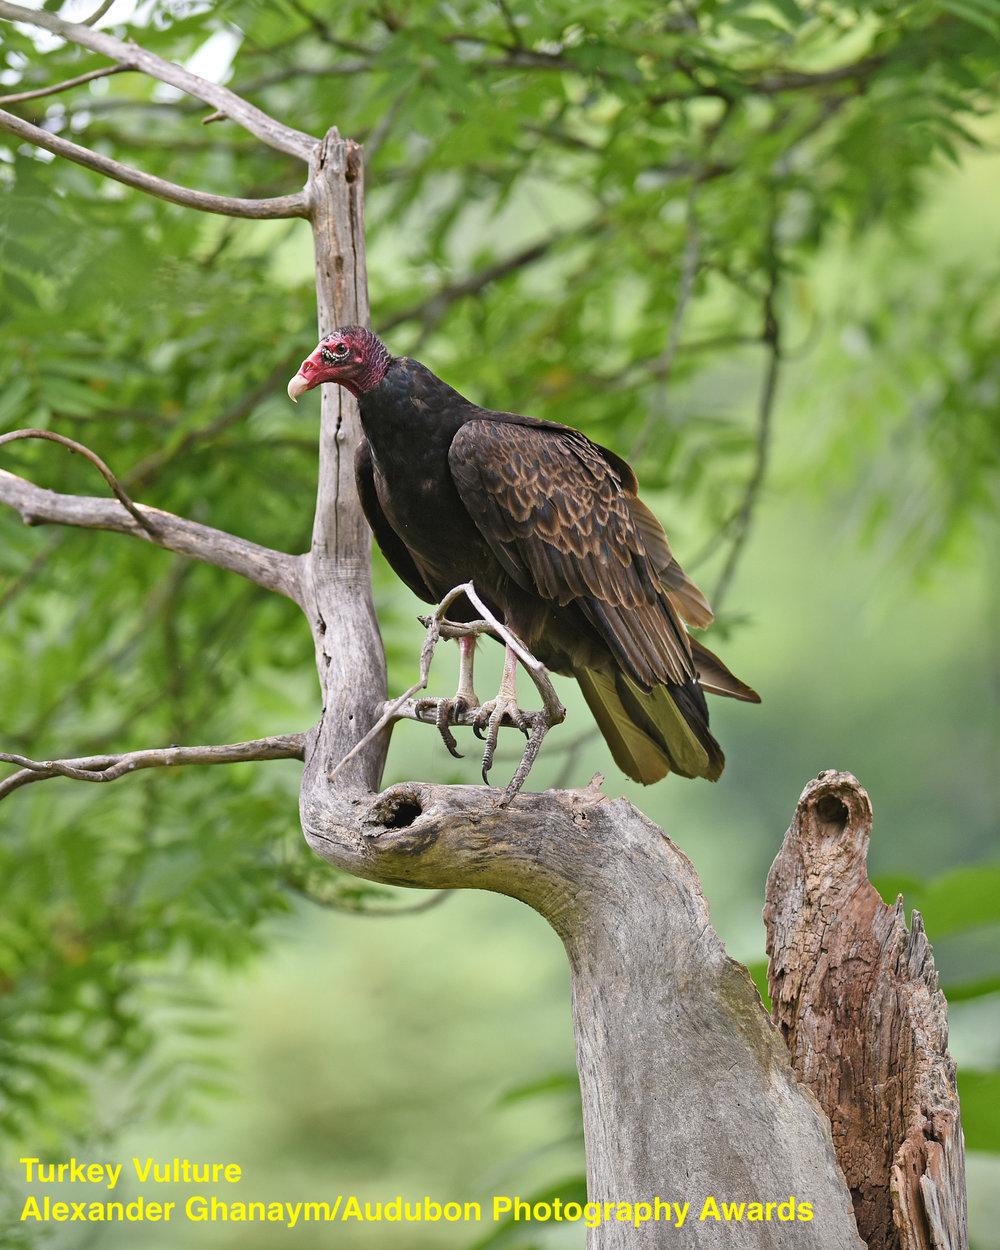 APA_2016_Turkey_Vulture_Alexander_Ghanayem_KK.jpg